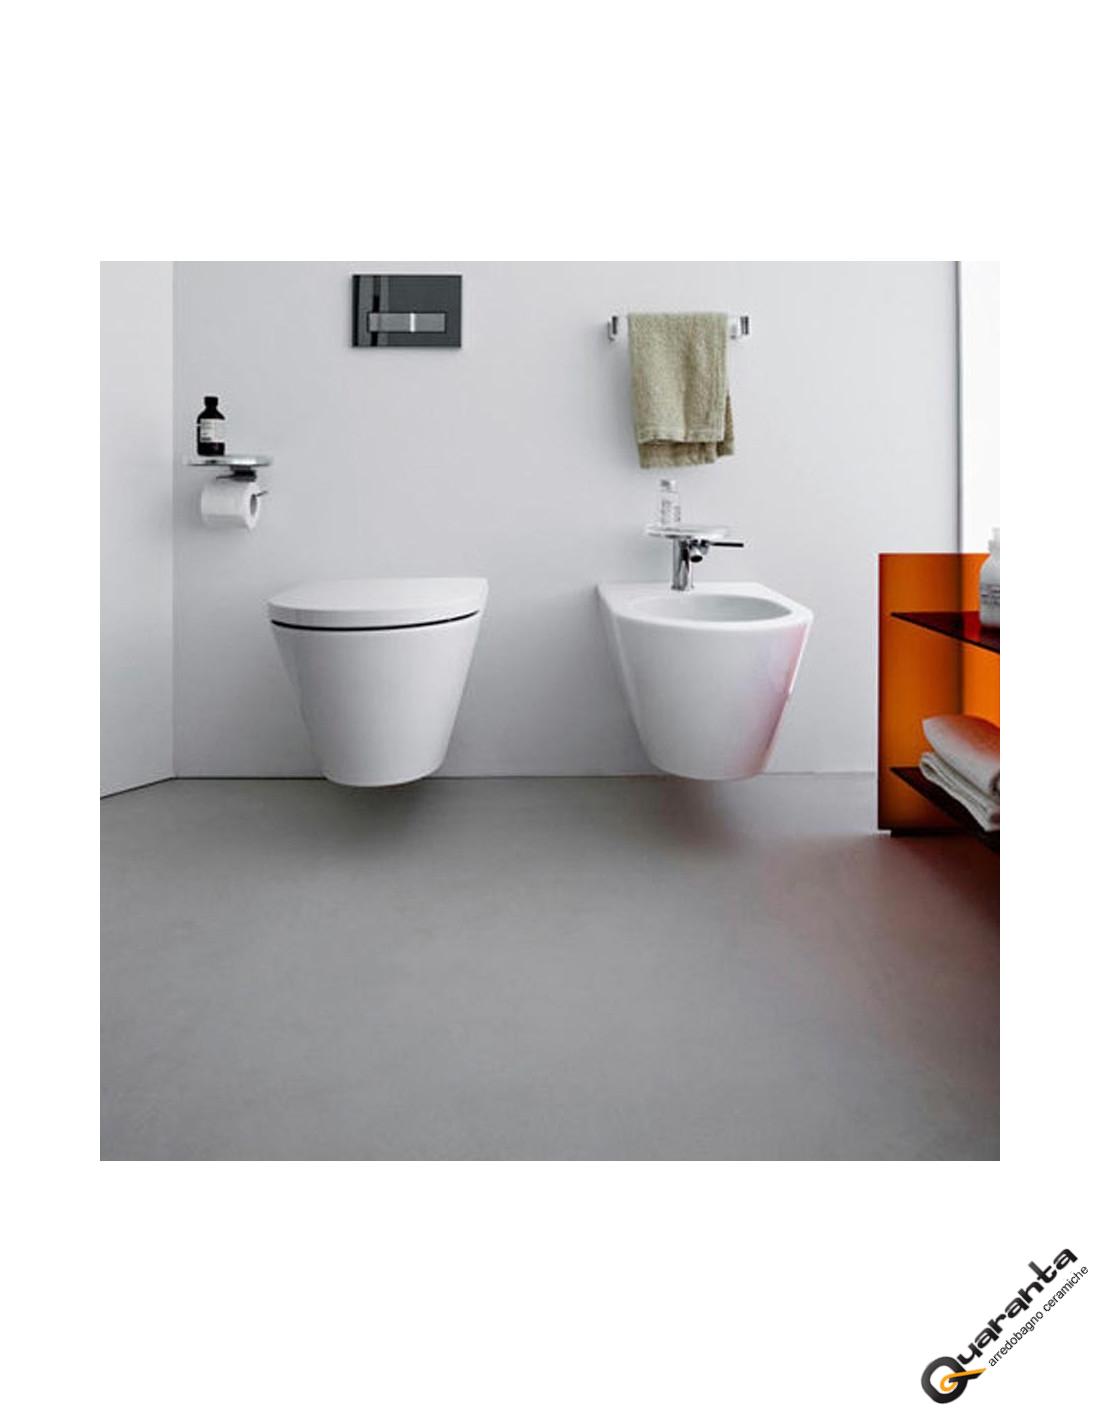 Laufen kartell sanitari sospesi quaranta ceramiche - Kartell accessori bagno ...